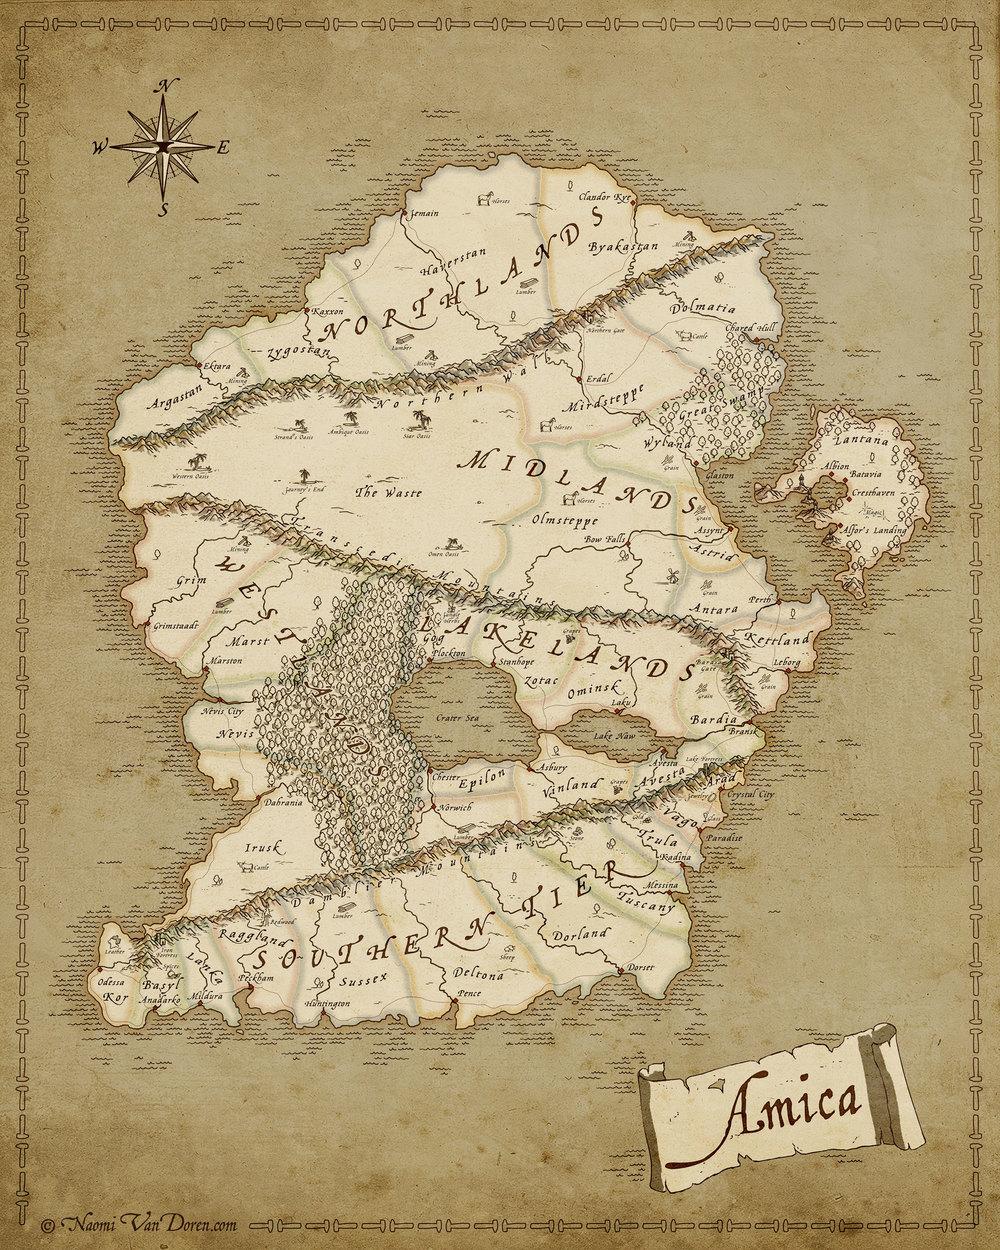 Amica-Map-Final-naomi-vandoren-2000.jpg